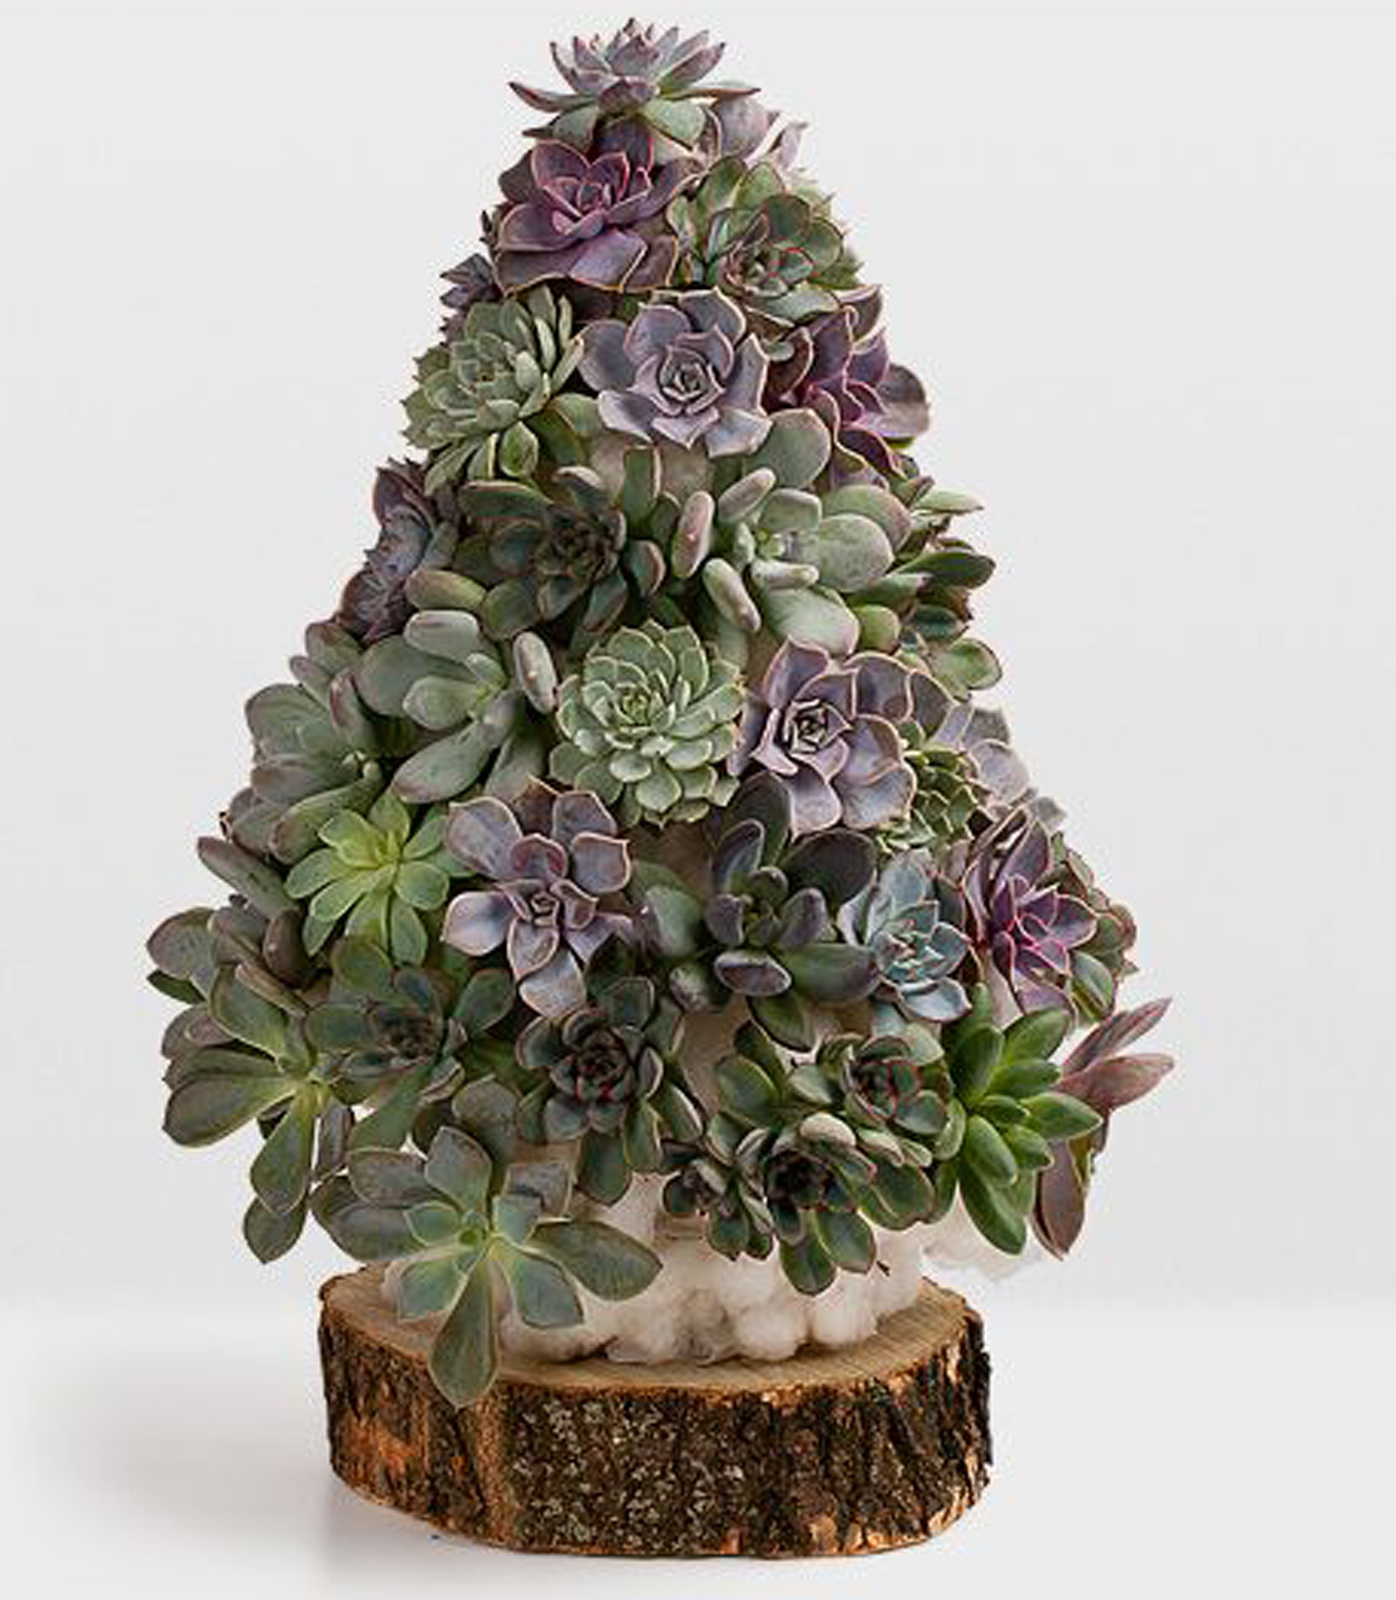 How To Make A Mini Succulent Christmas Tree 9homes